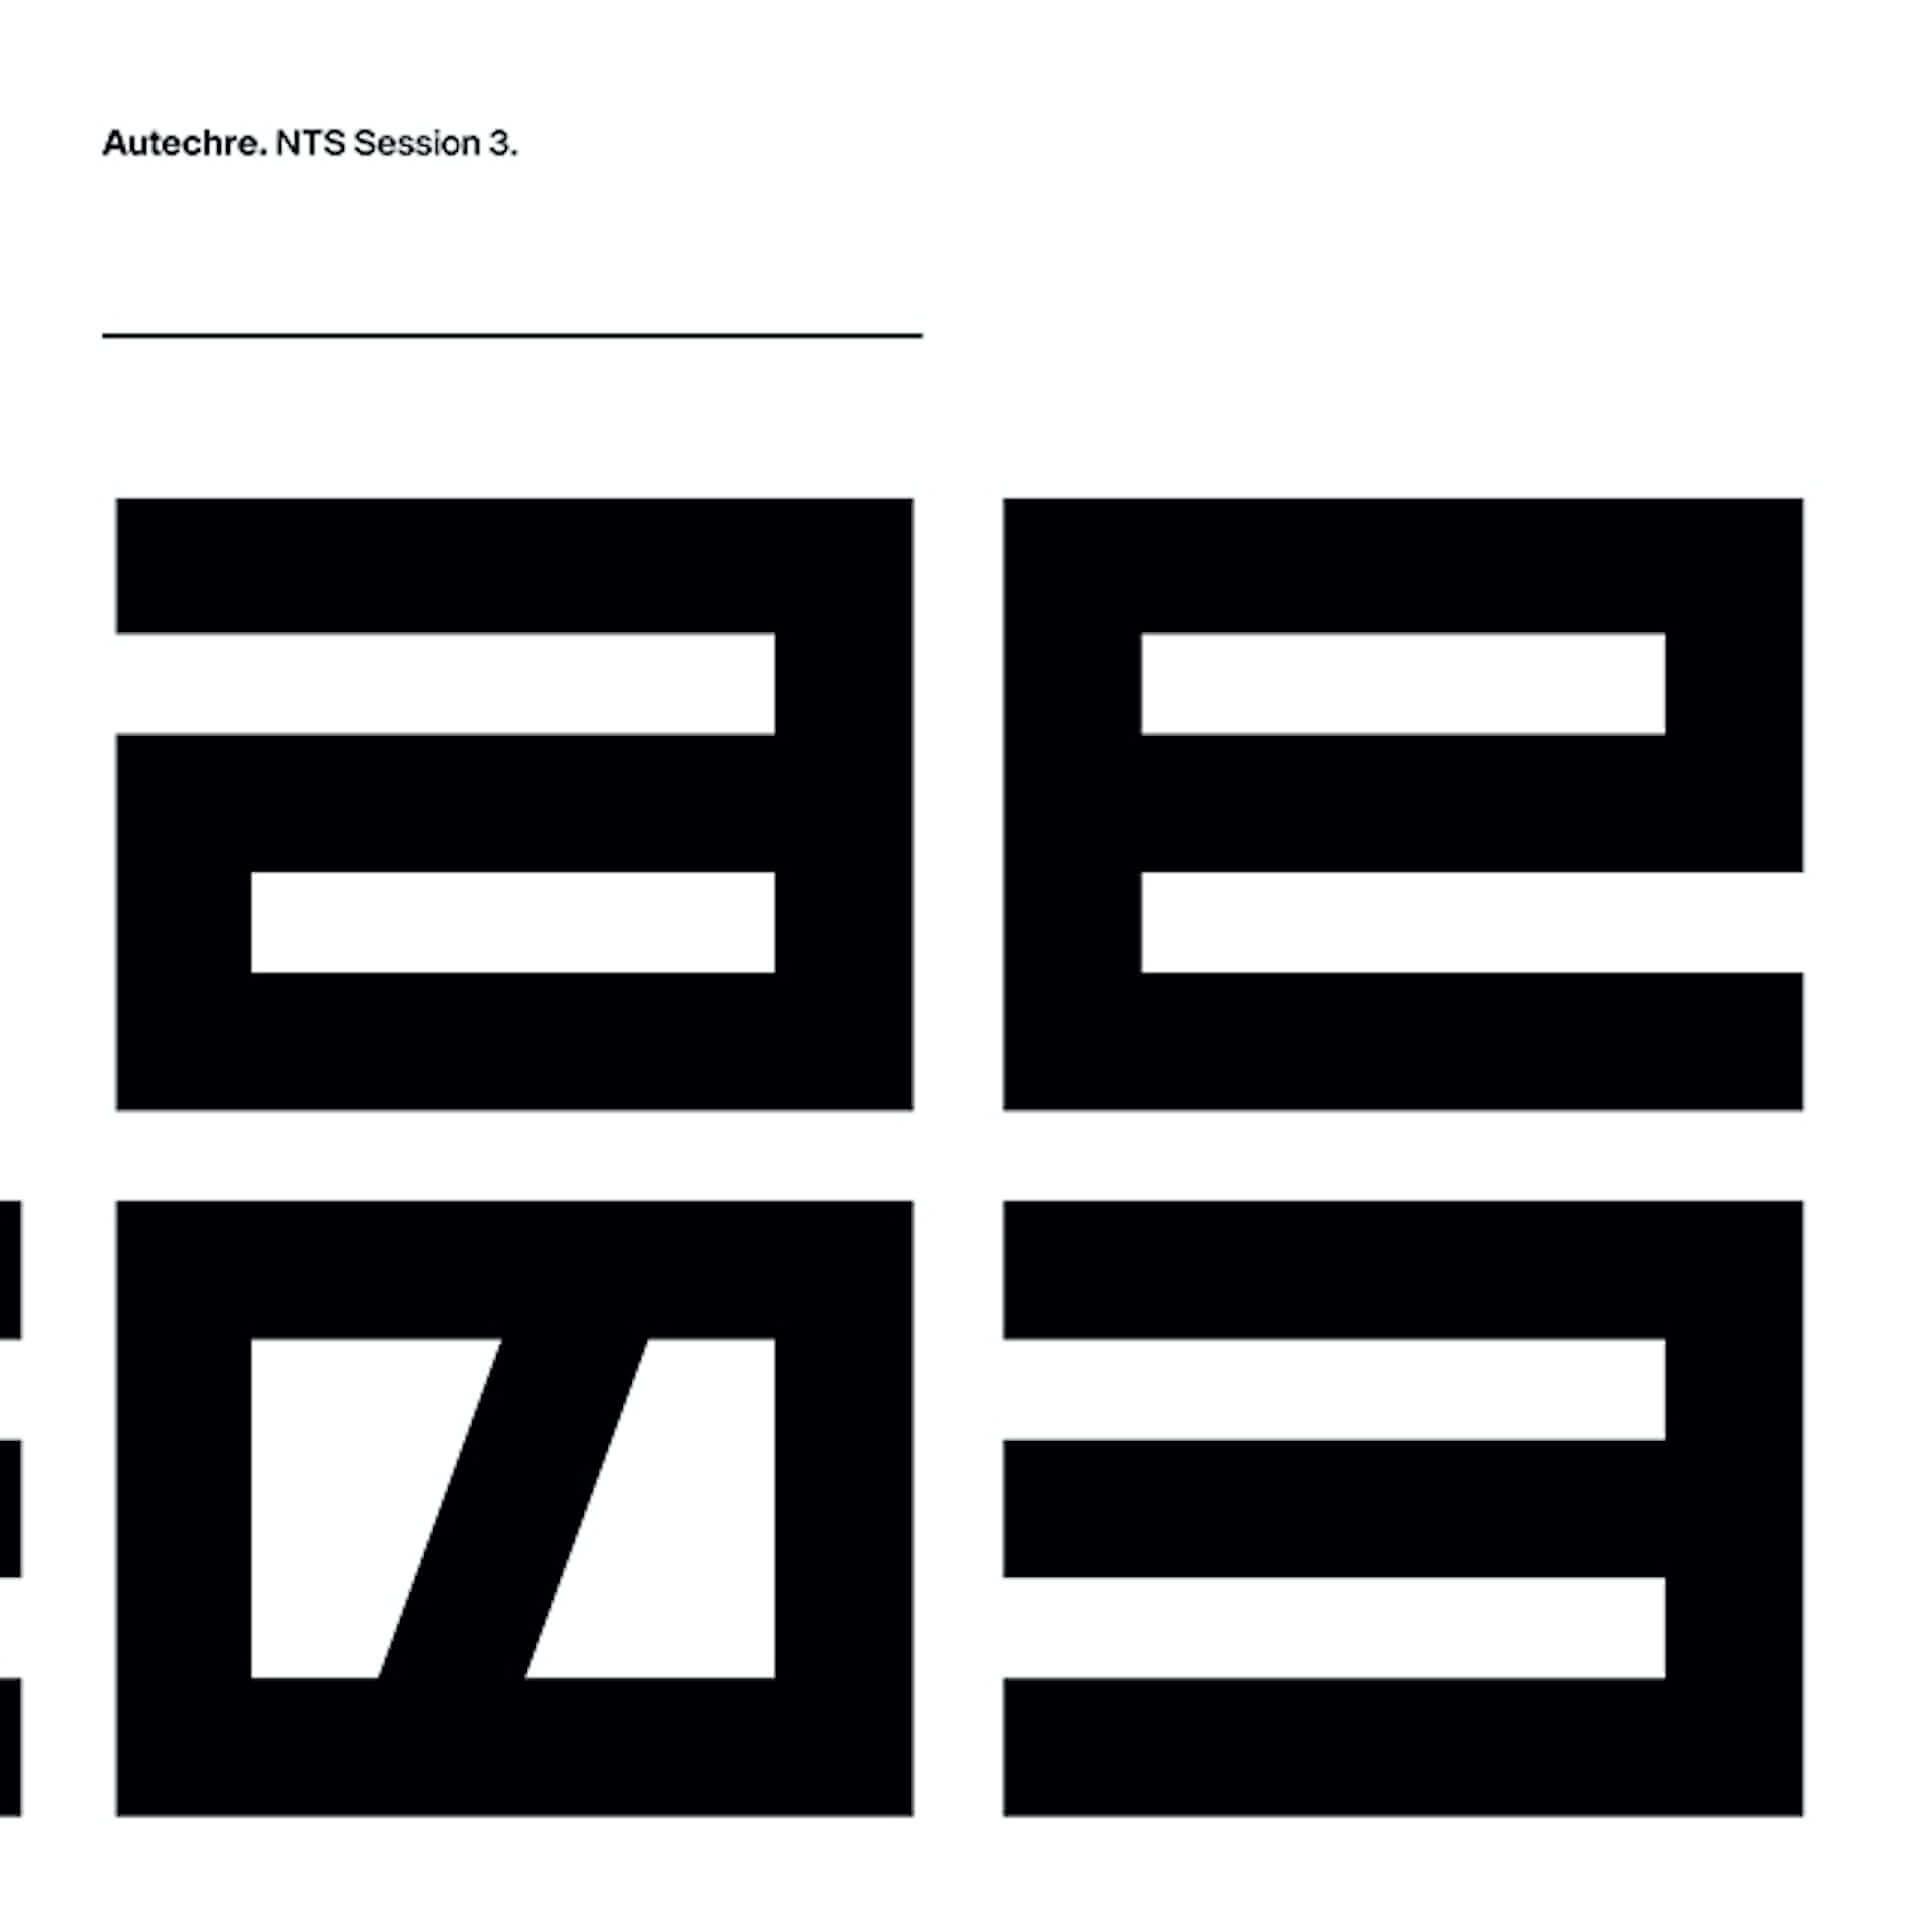 Autechreが2016年〜2018年のライブ音源7作をリリース!至極のIDM/エレクトロニカ作品 music200410_autechre_4-1920x1920